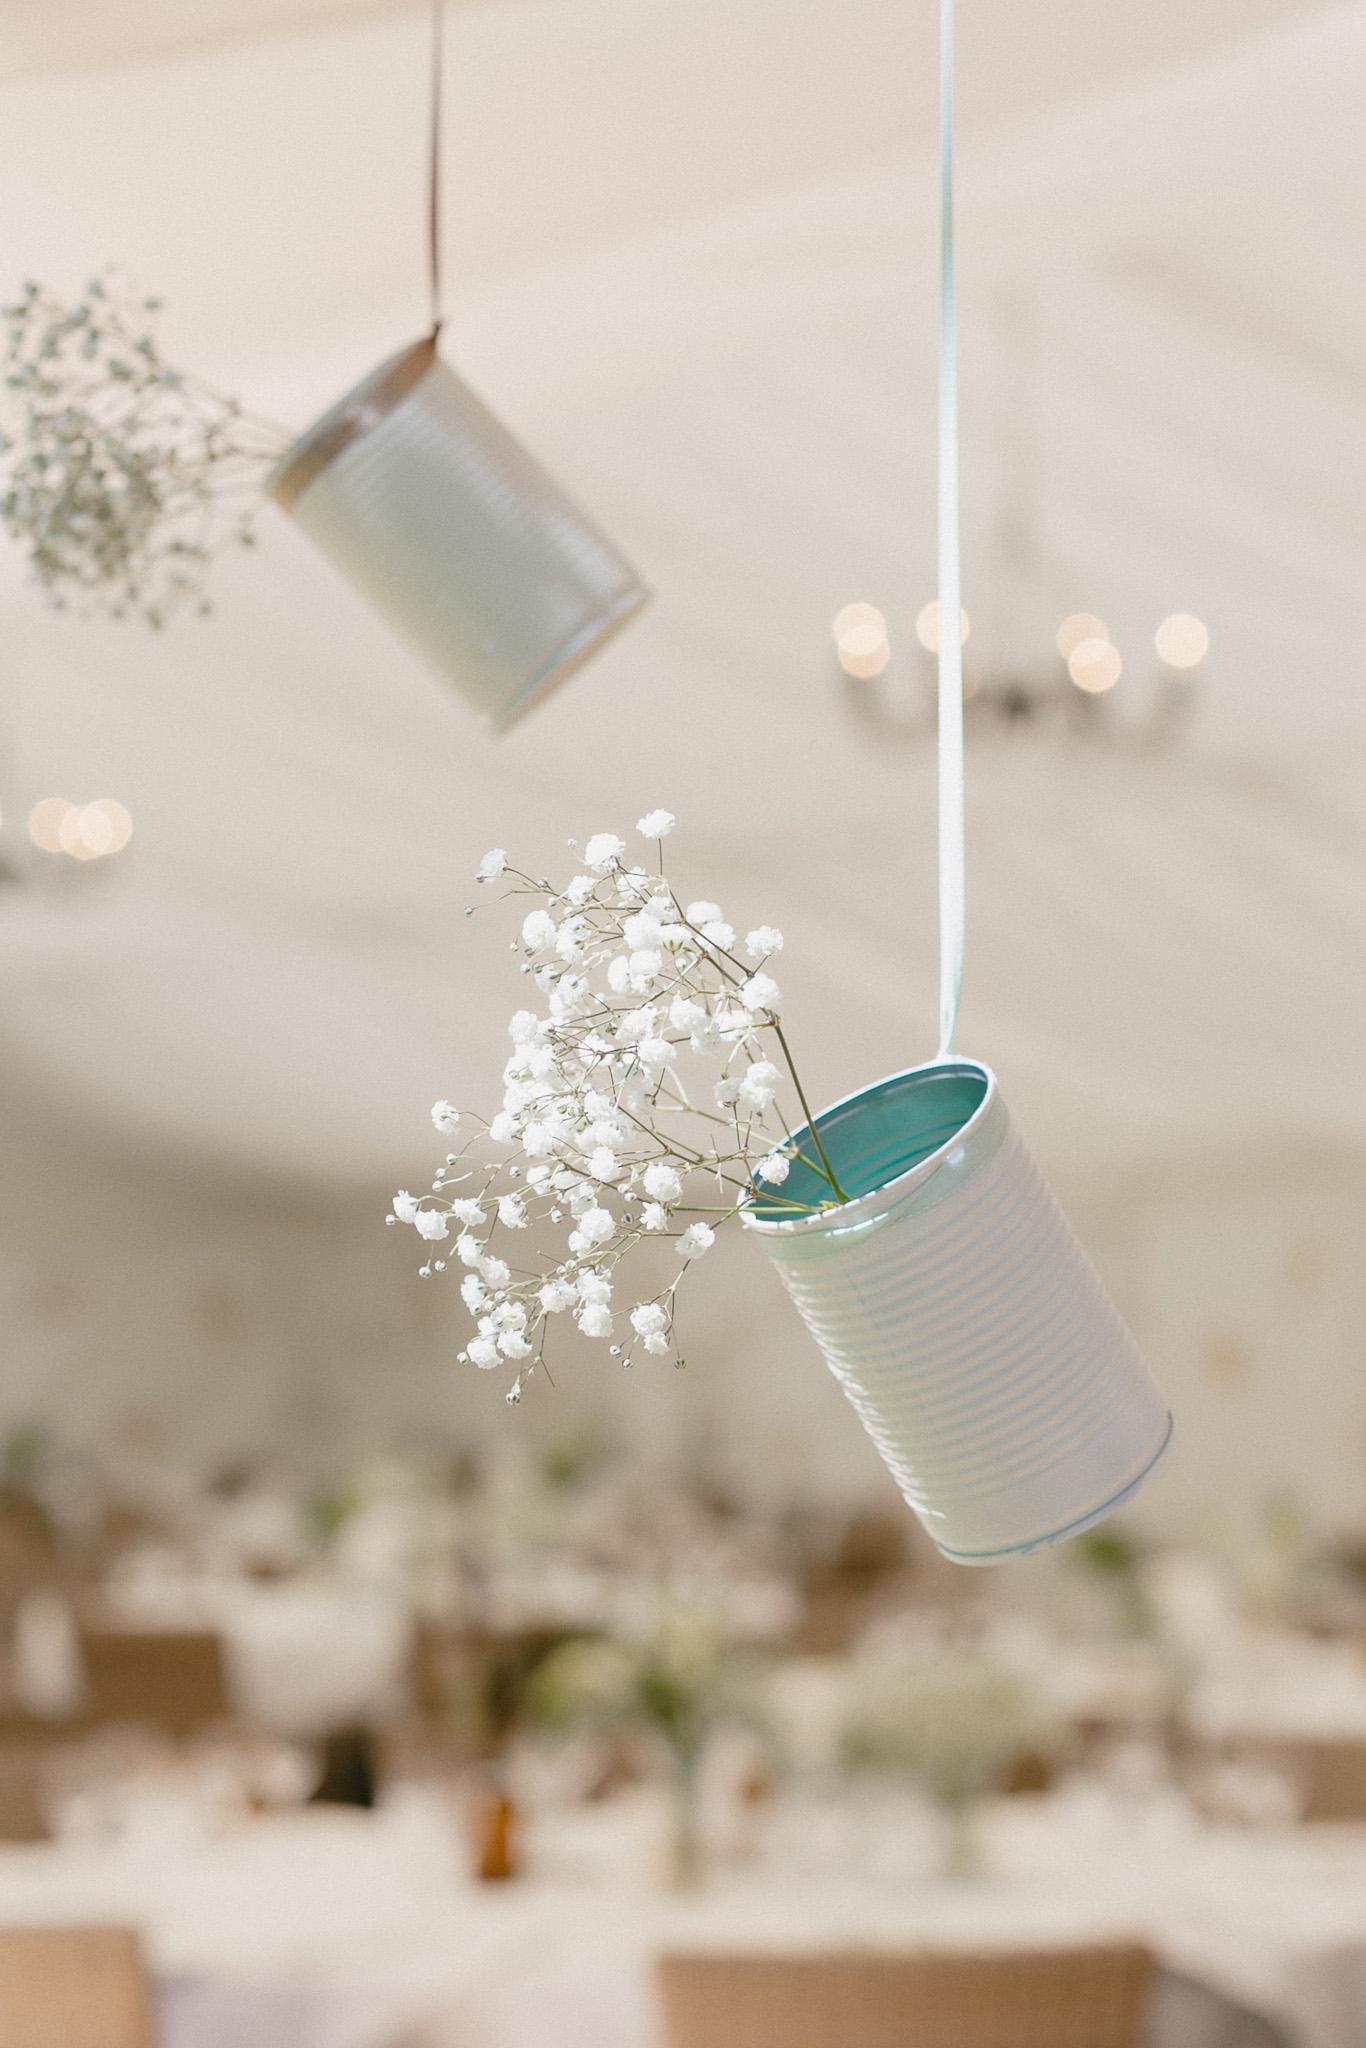 Blechdose Upcycling Vase Hochzeit